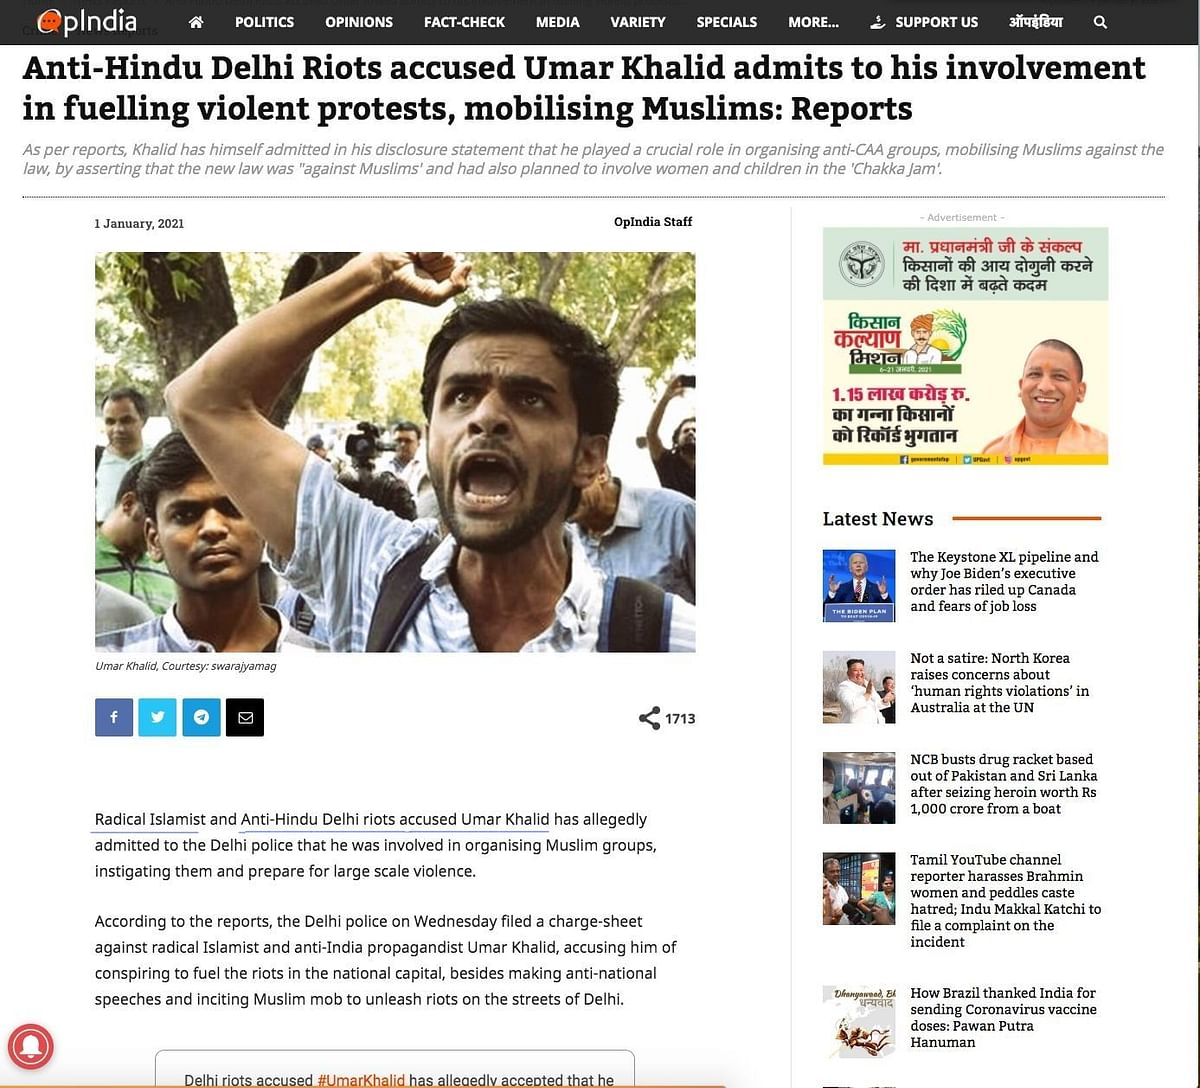 Delhi Court on Umar Khalid's Trial by Media: News Must be Verified